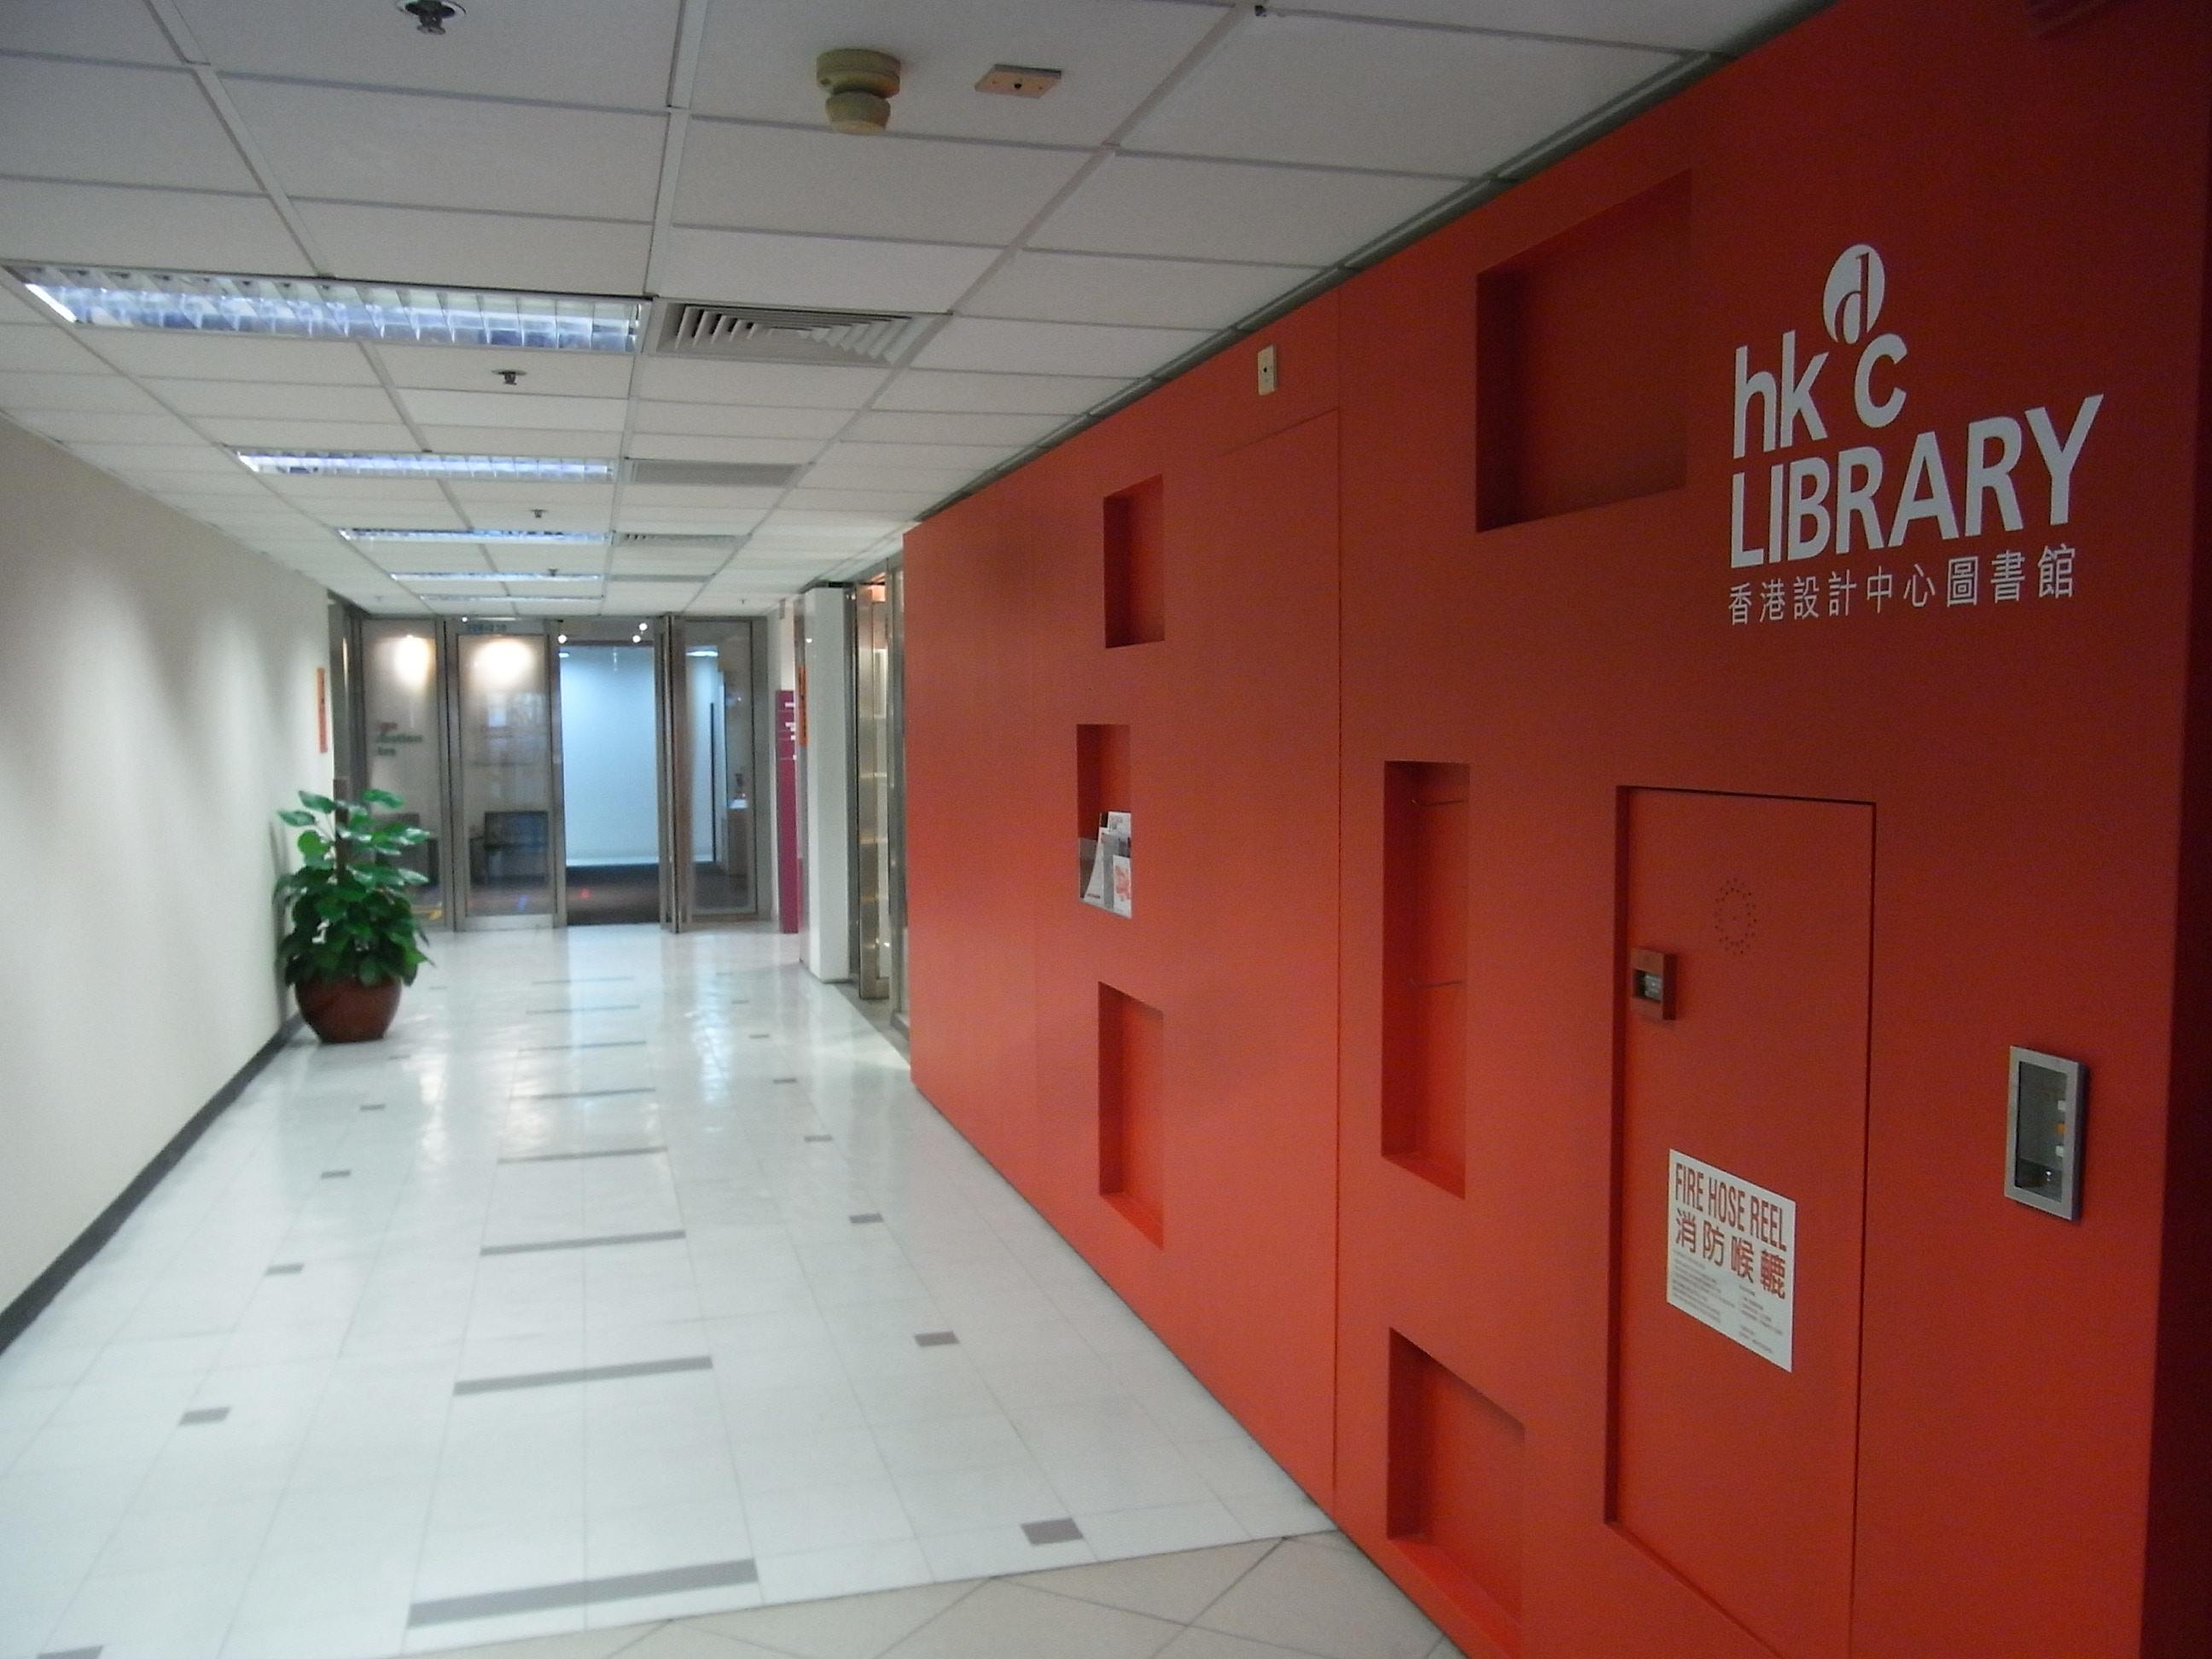 FileHK Kln Tong InnoCentre Hong Kong C Library Corridor